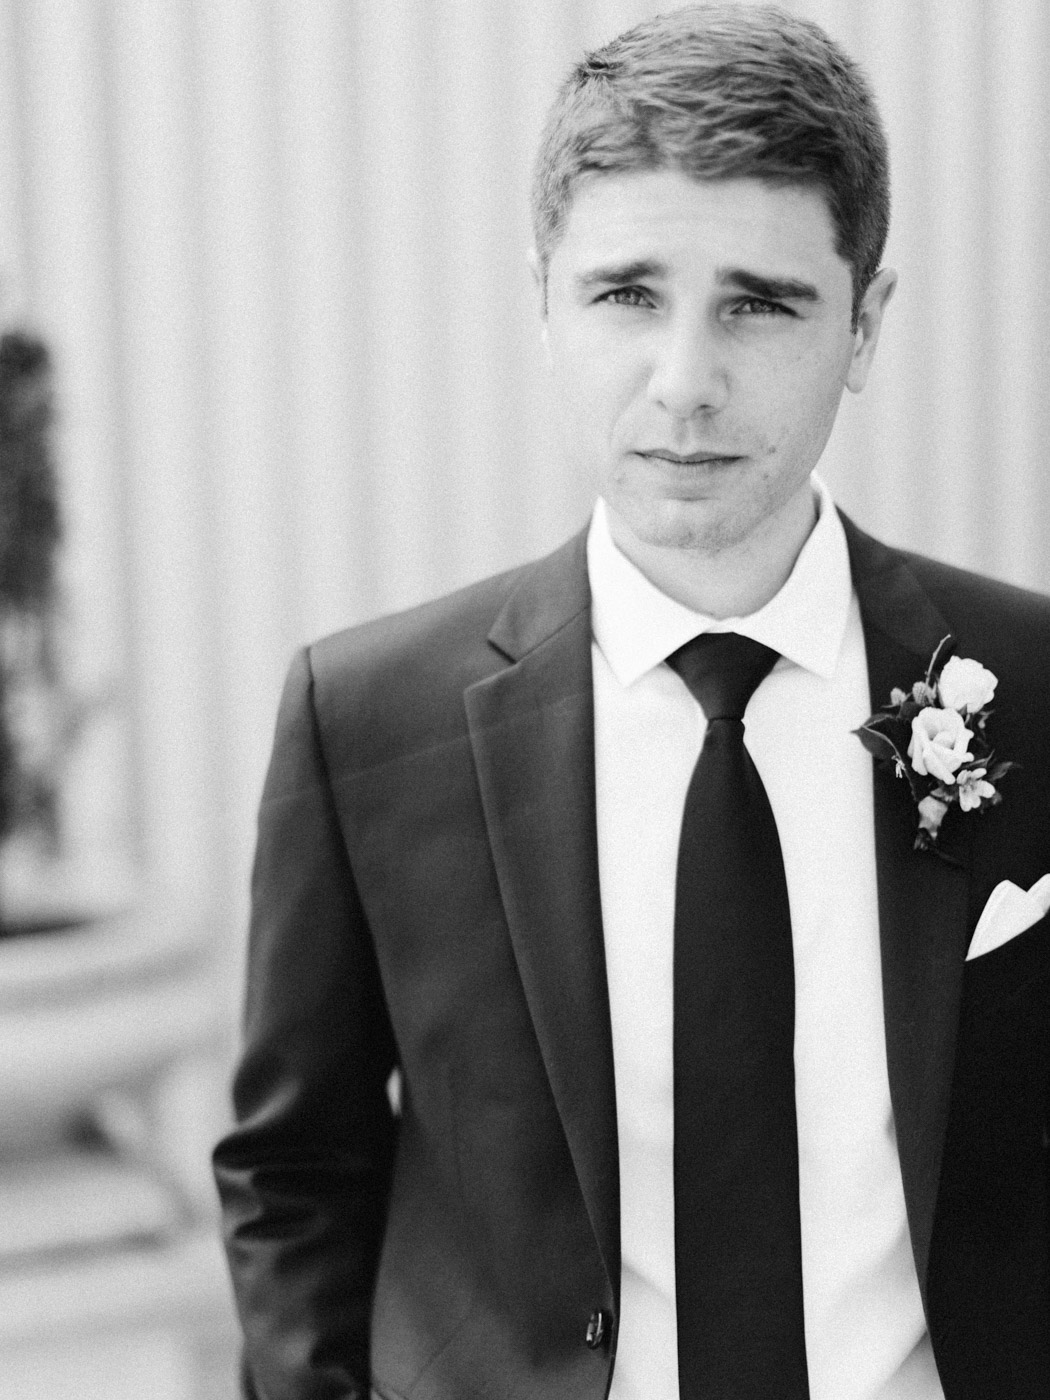 downtown-toronto-wedding-photographer-berkley-fieldhouse-blush-138.jpg